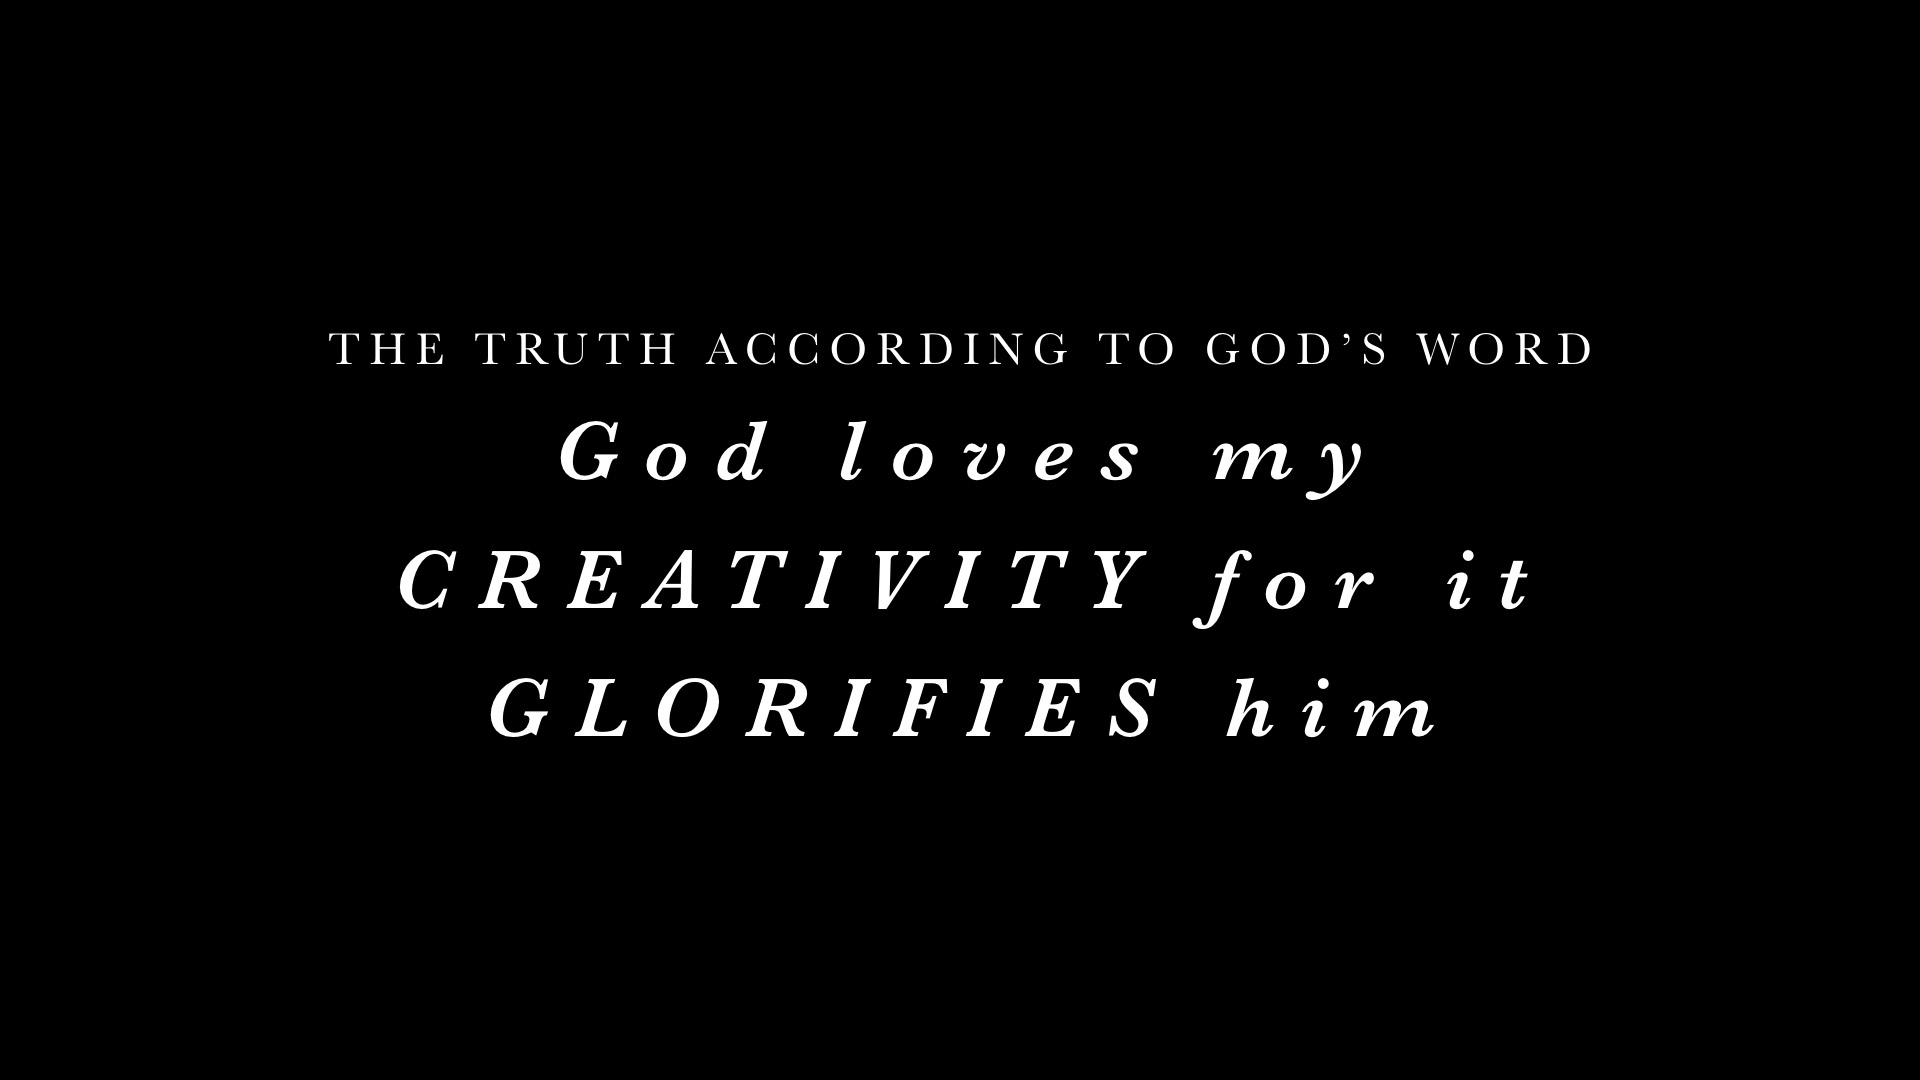 Creativity.025.jpg